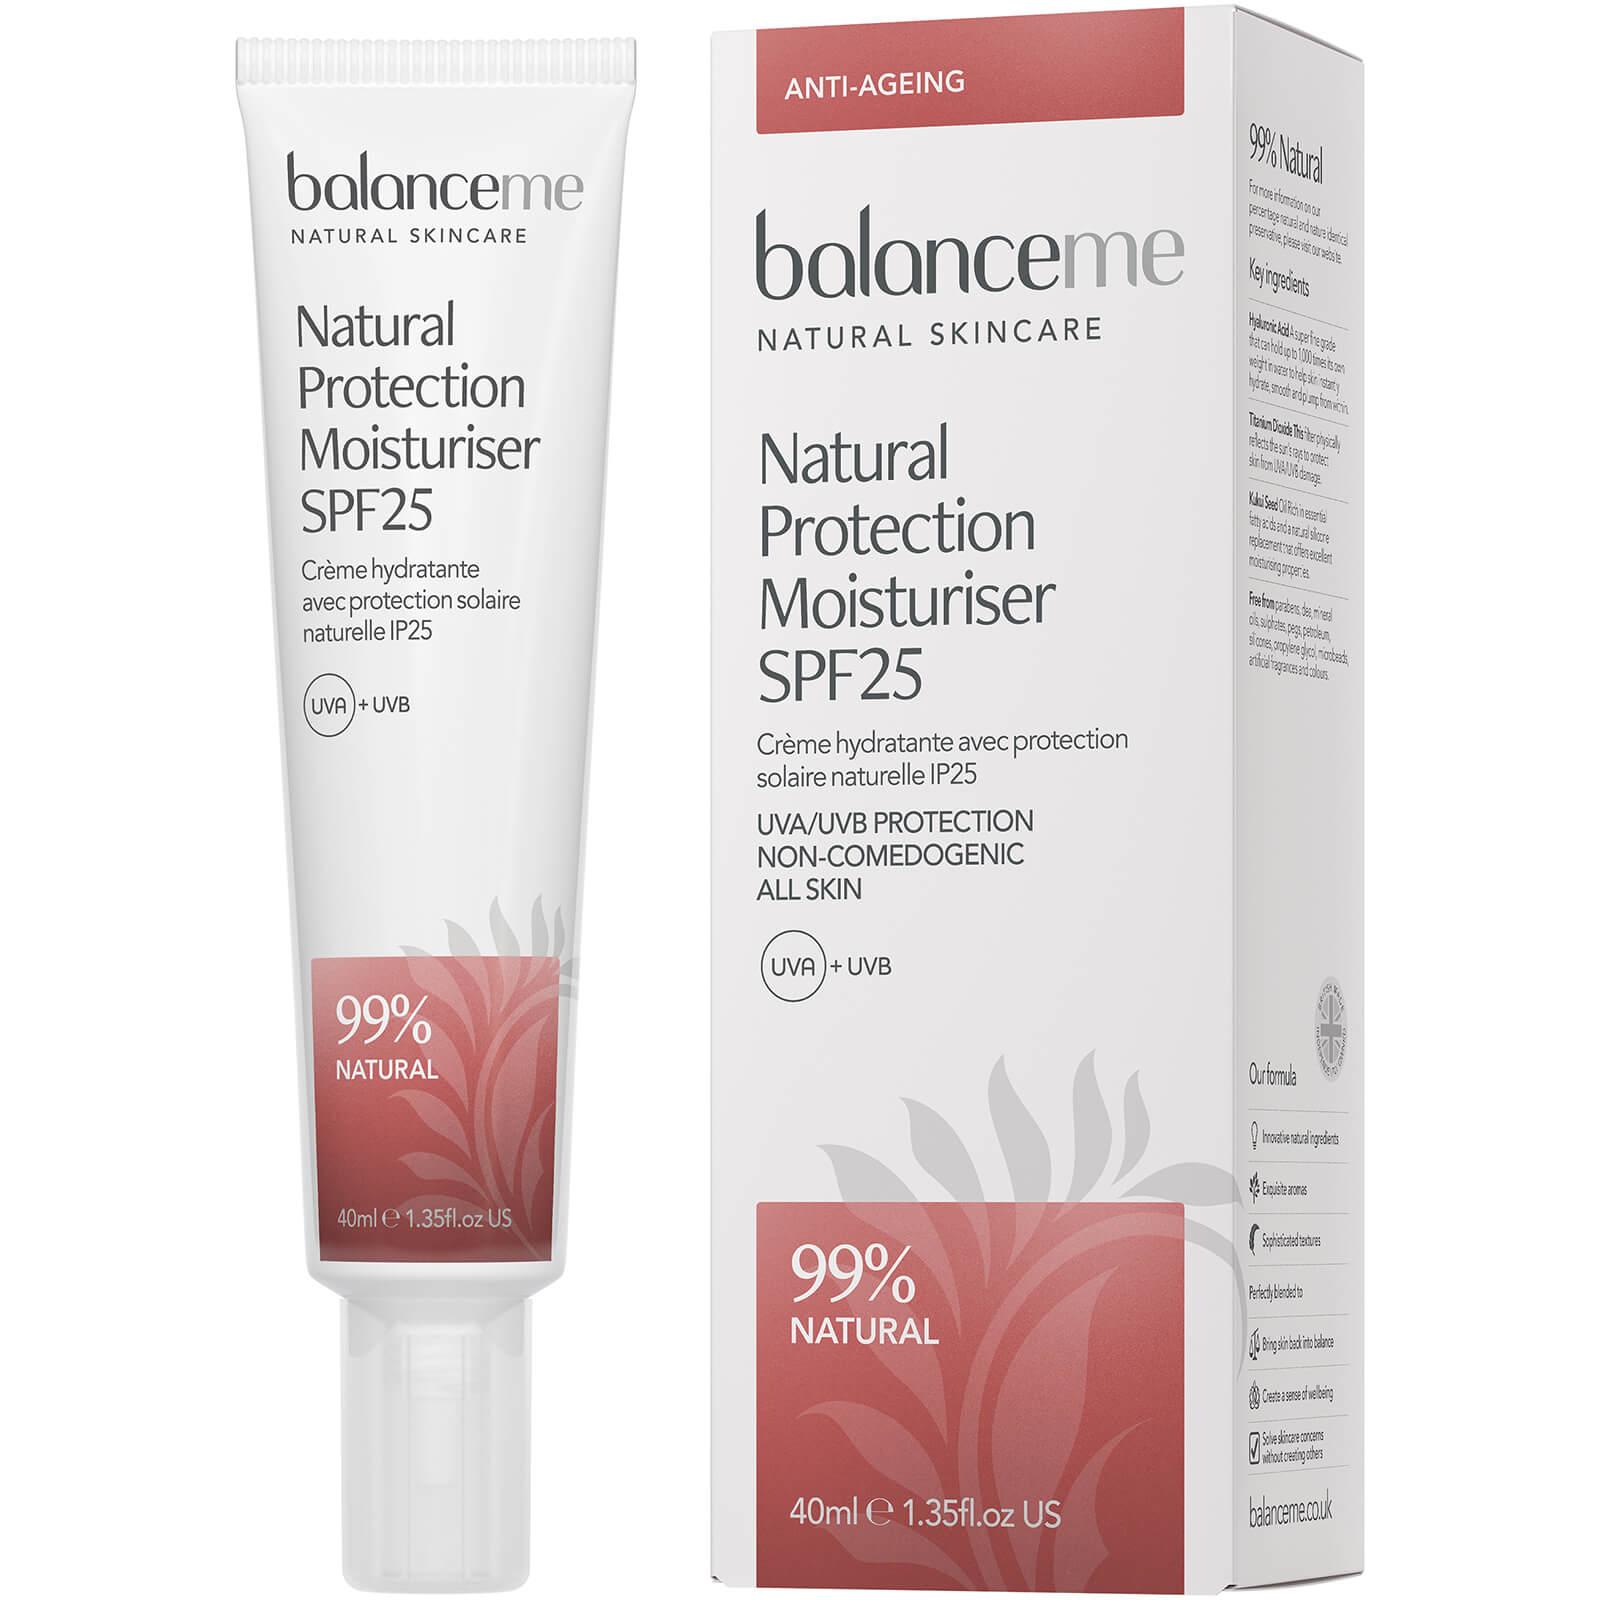 Balance Me Natural Protection Daily Moisturiser SPF 25 40ml